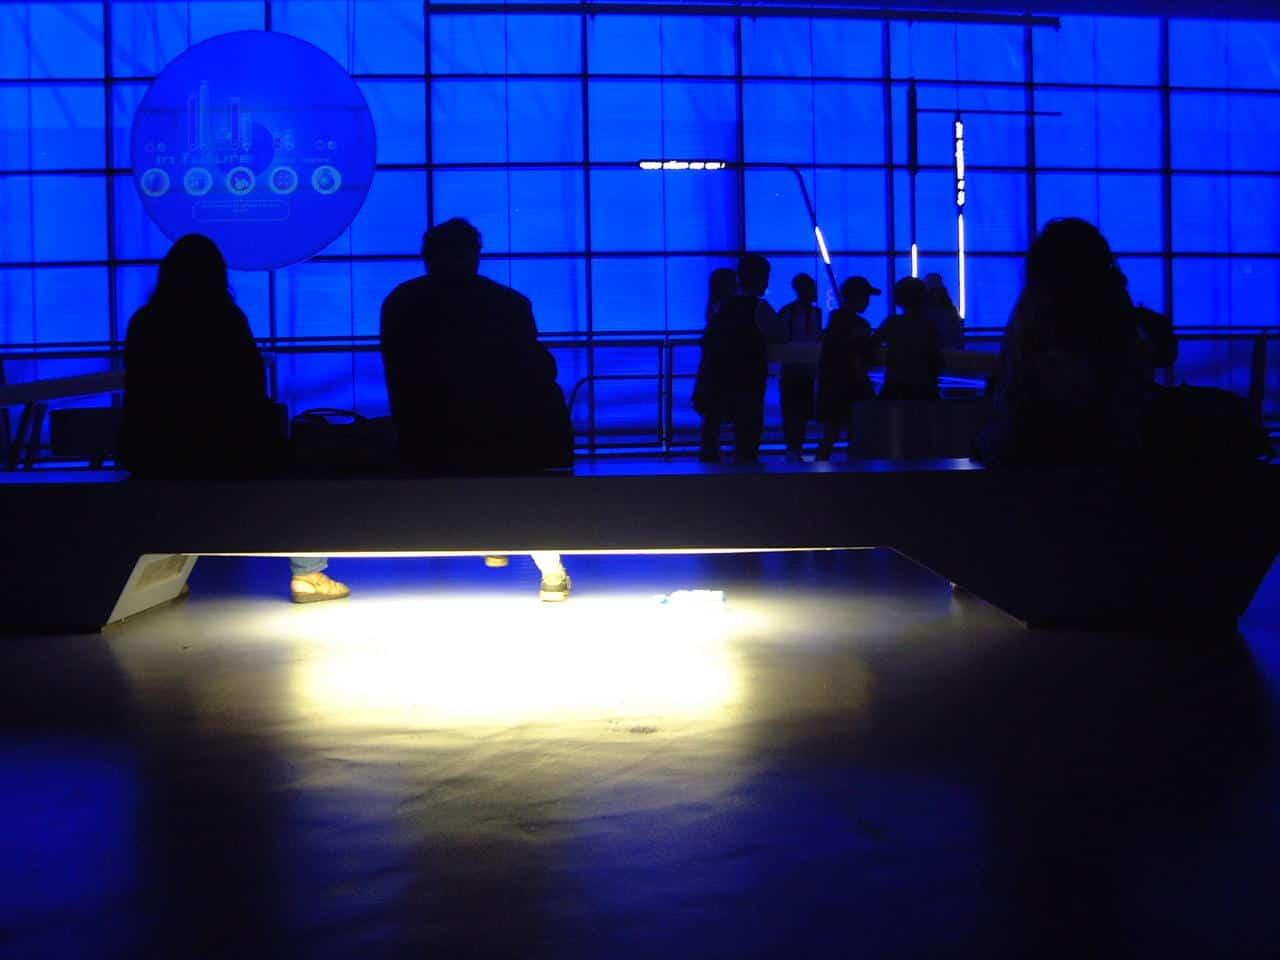 blue-science-1501036-1280x960